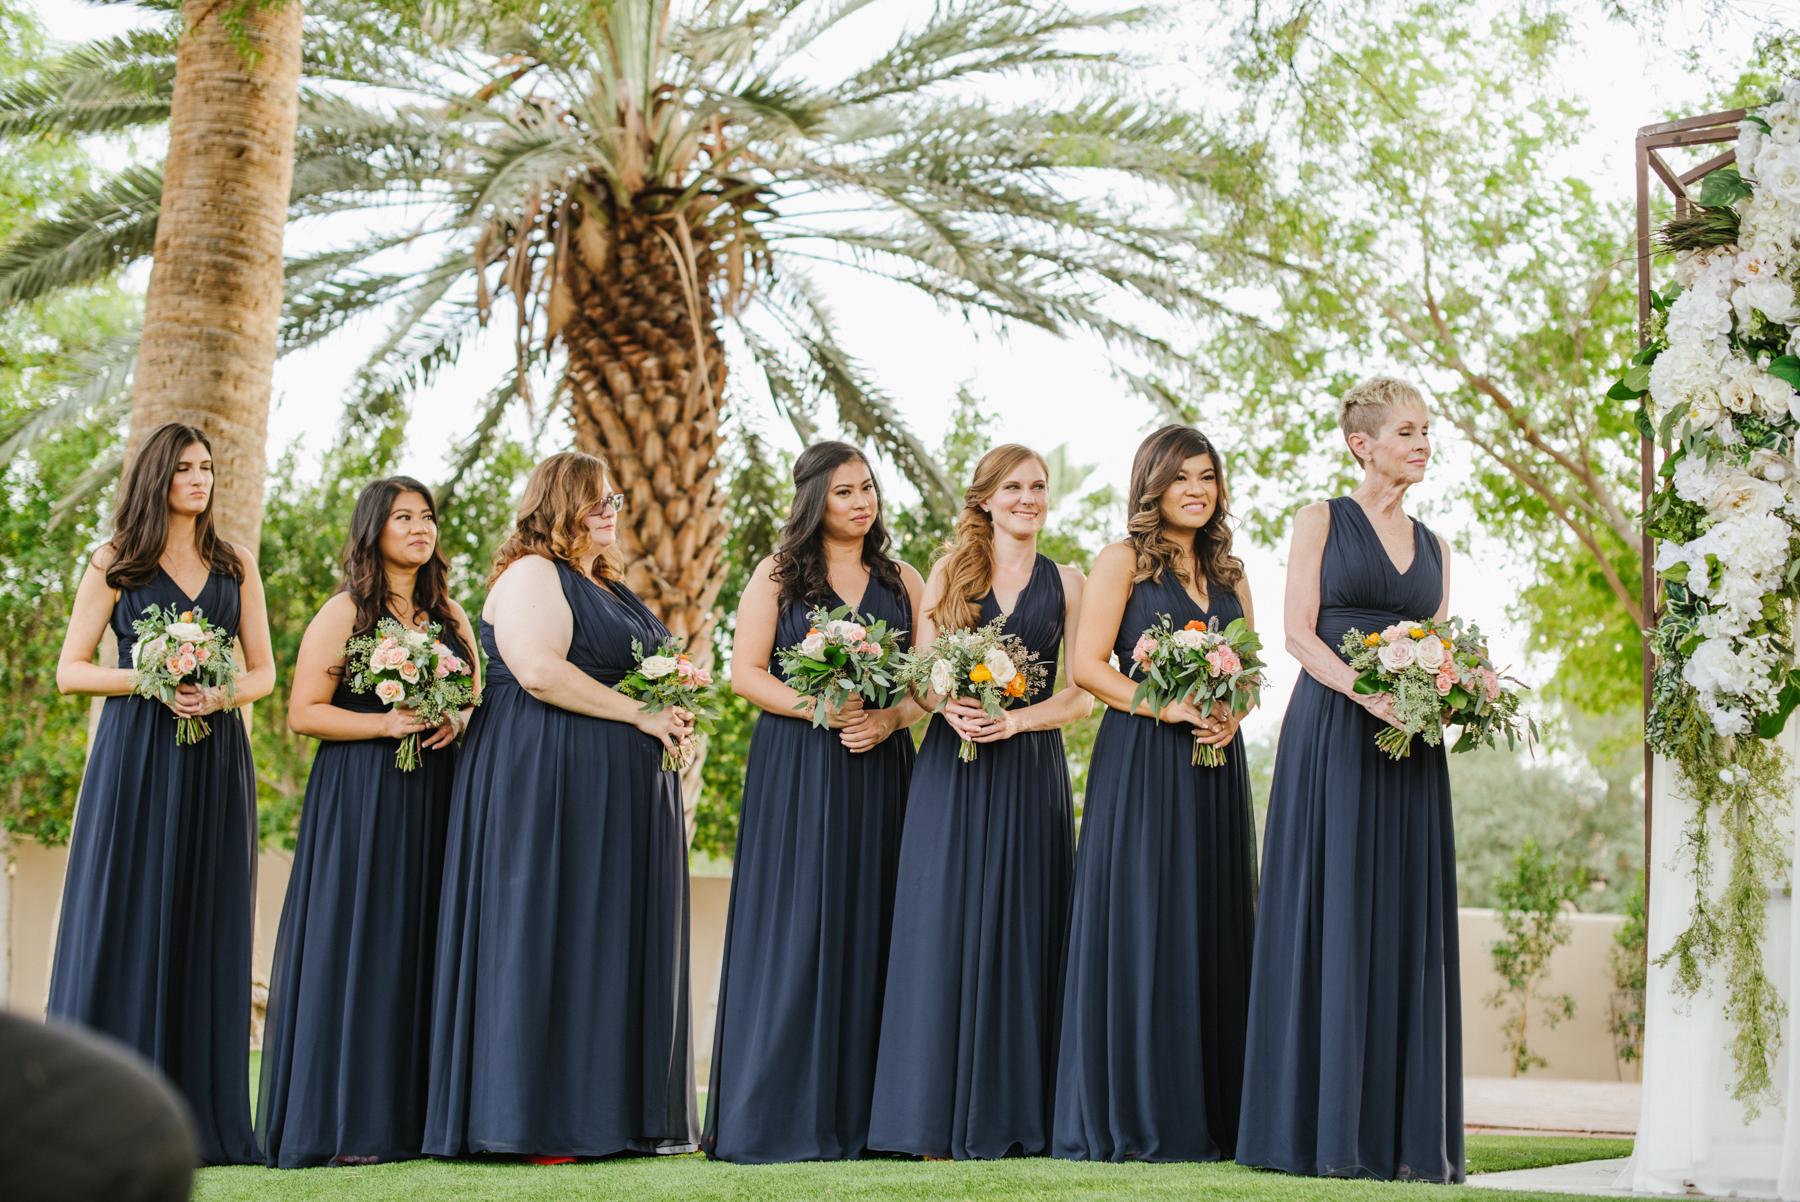 Secret Garden Event Center Wedding - Meredith Amadee Photography-2-2.jpg